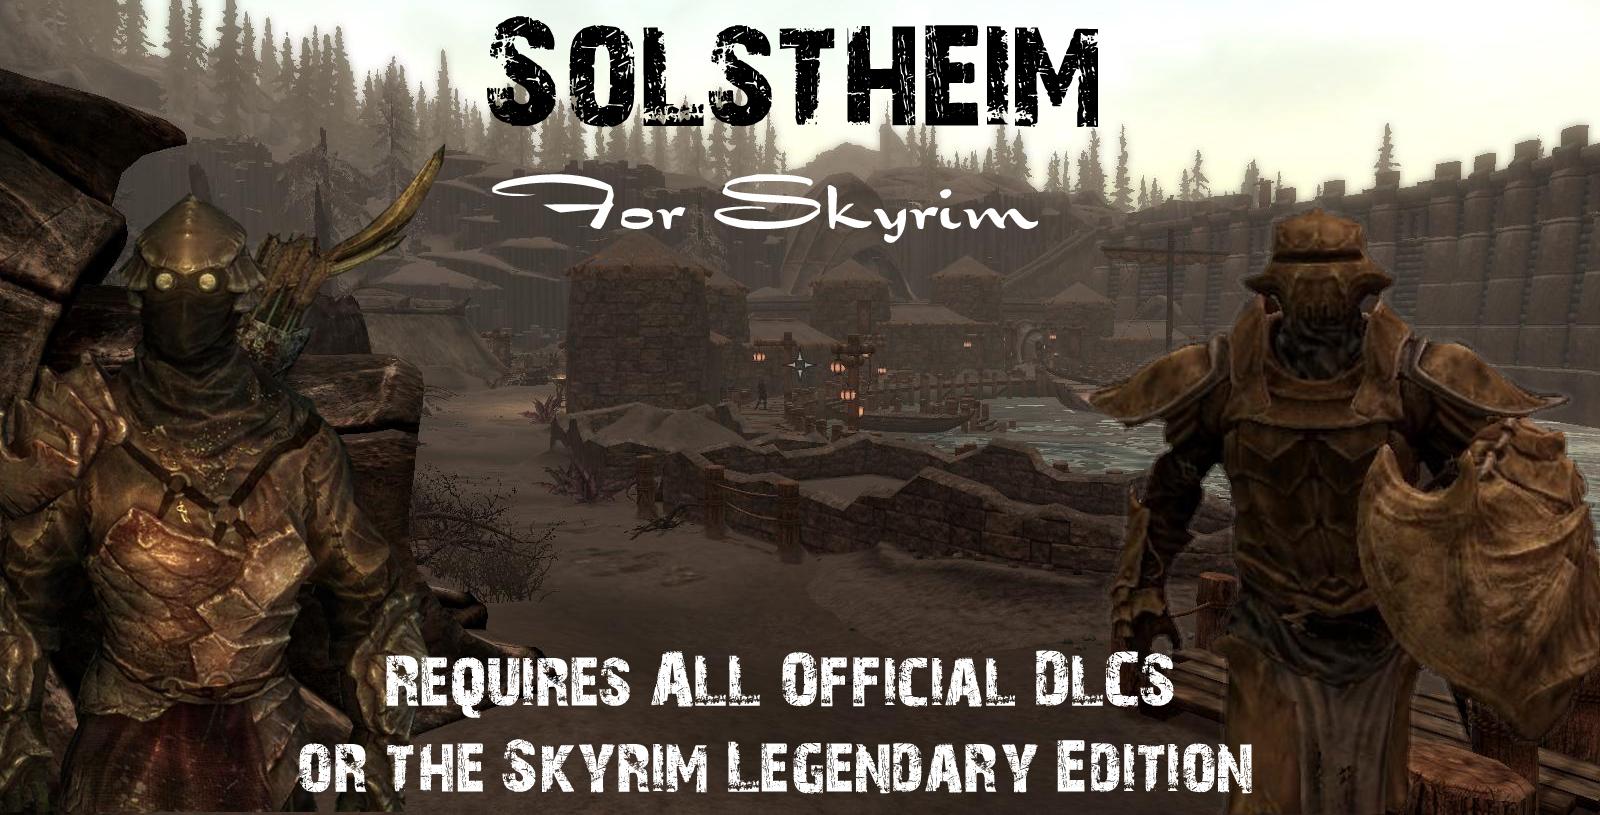 Solstheim V2.6 mod for Elder Scrolls V: Skyrim - Mod DB